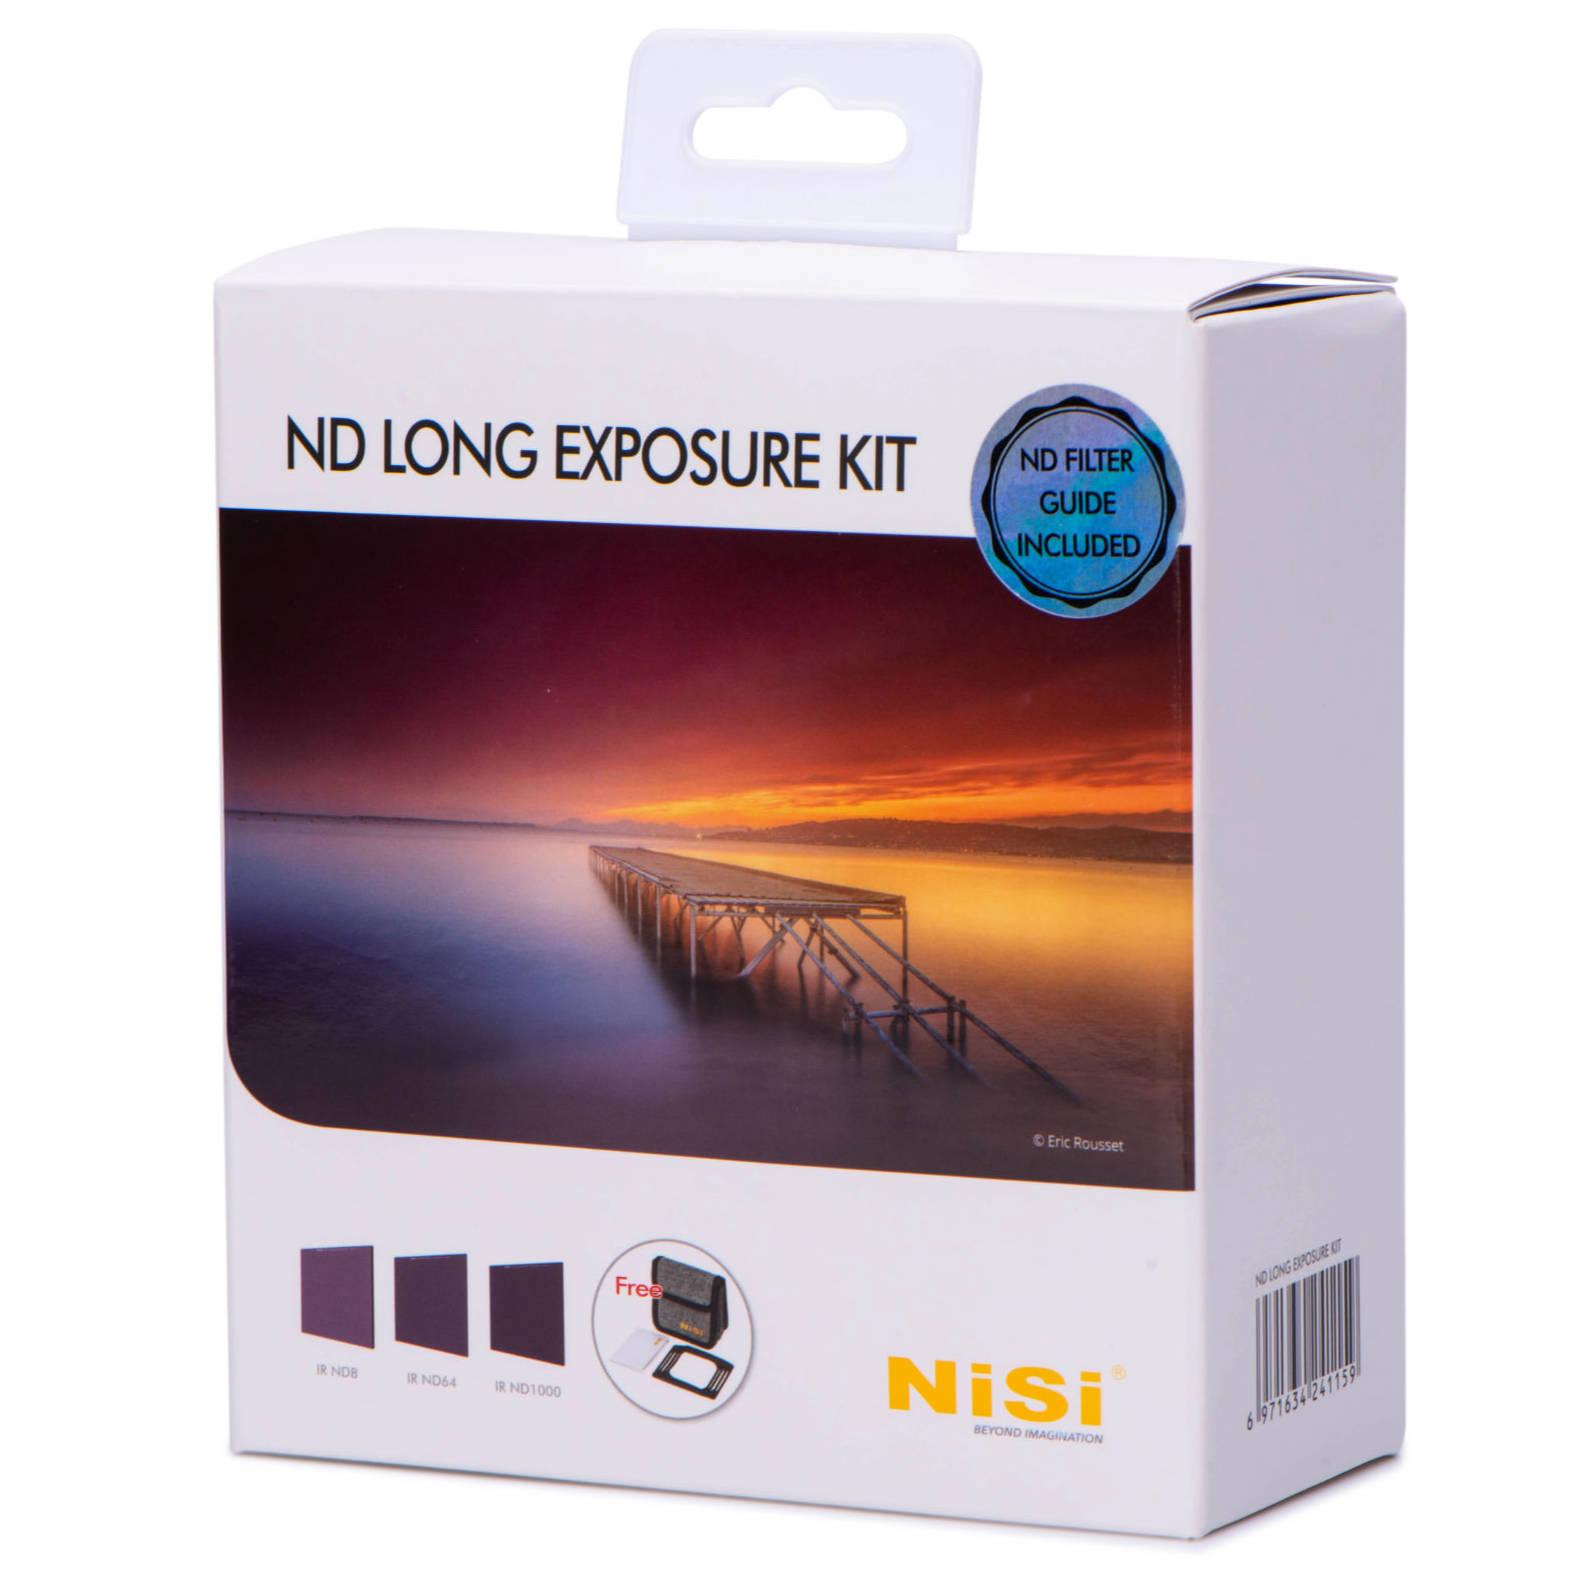 ND Long Exposure Kit